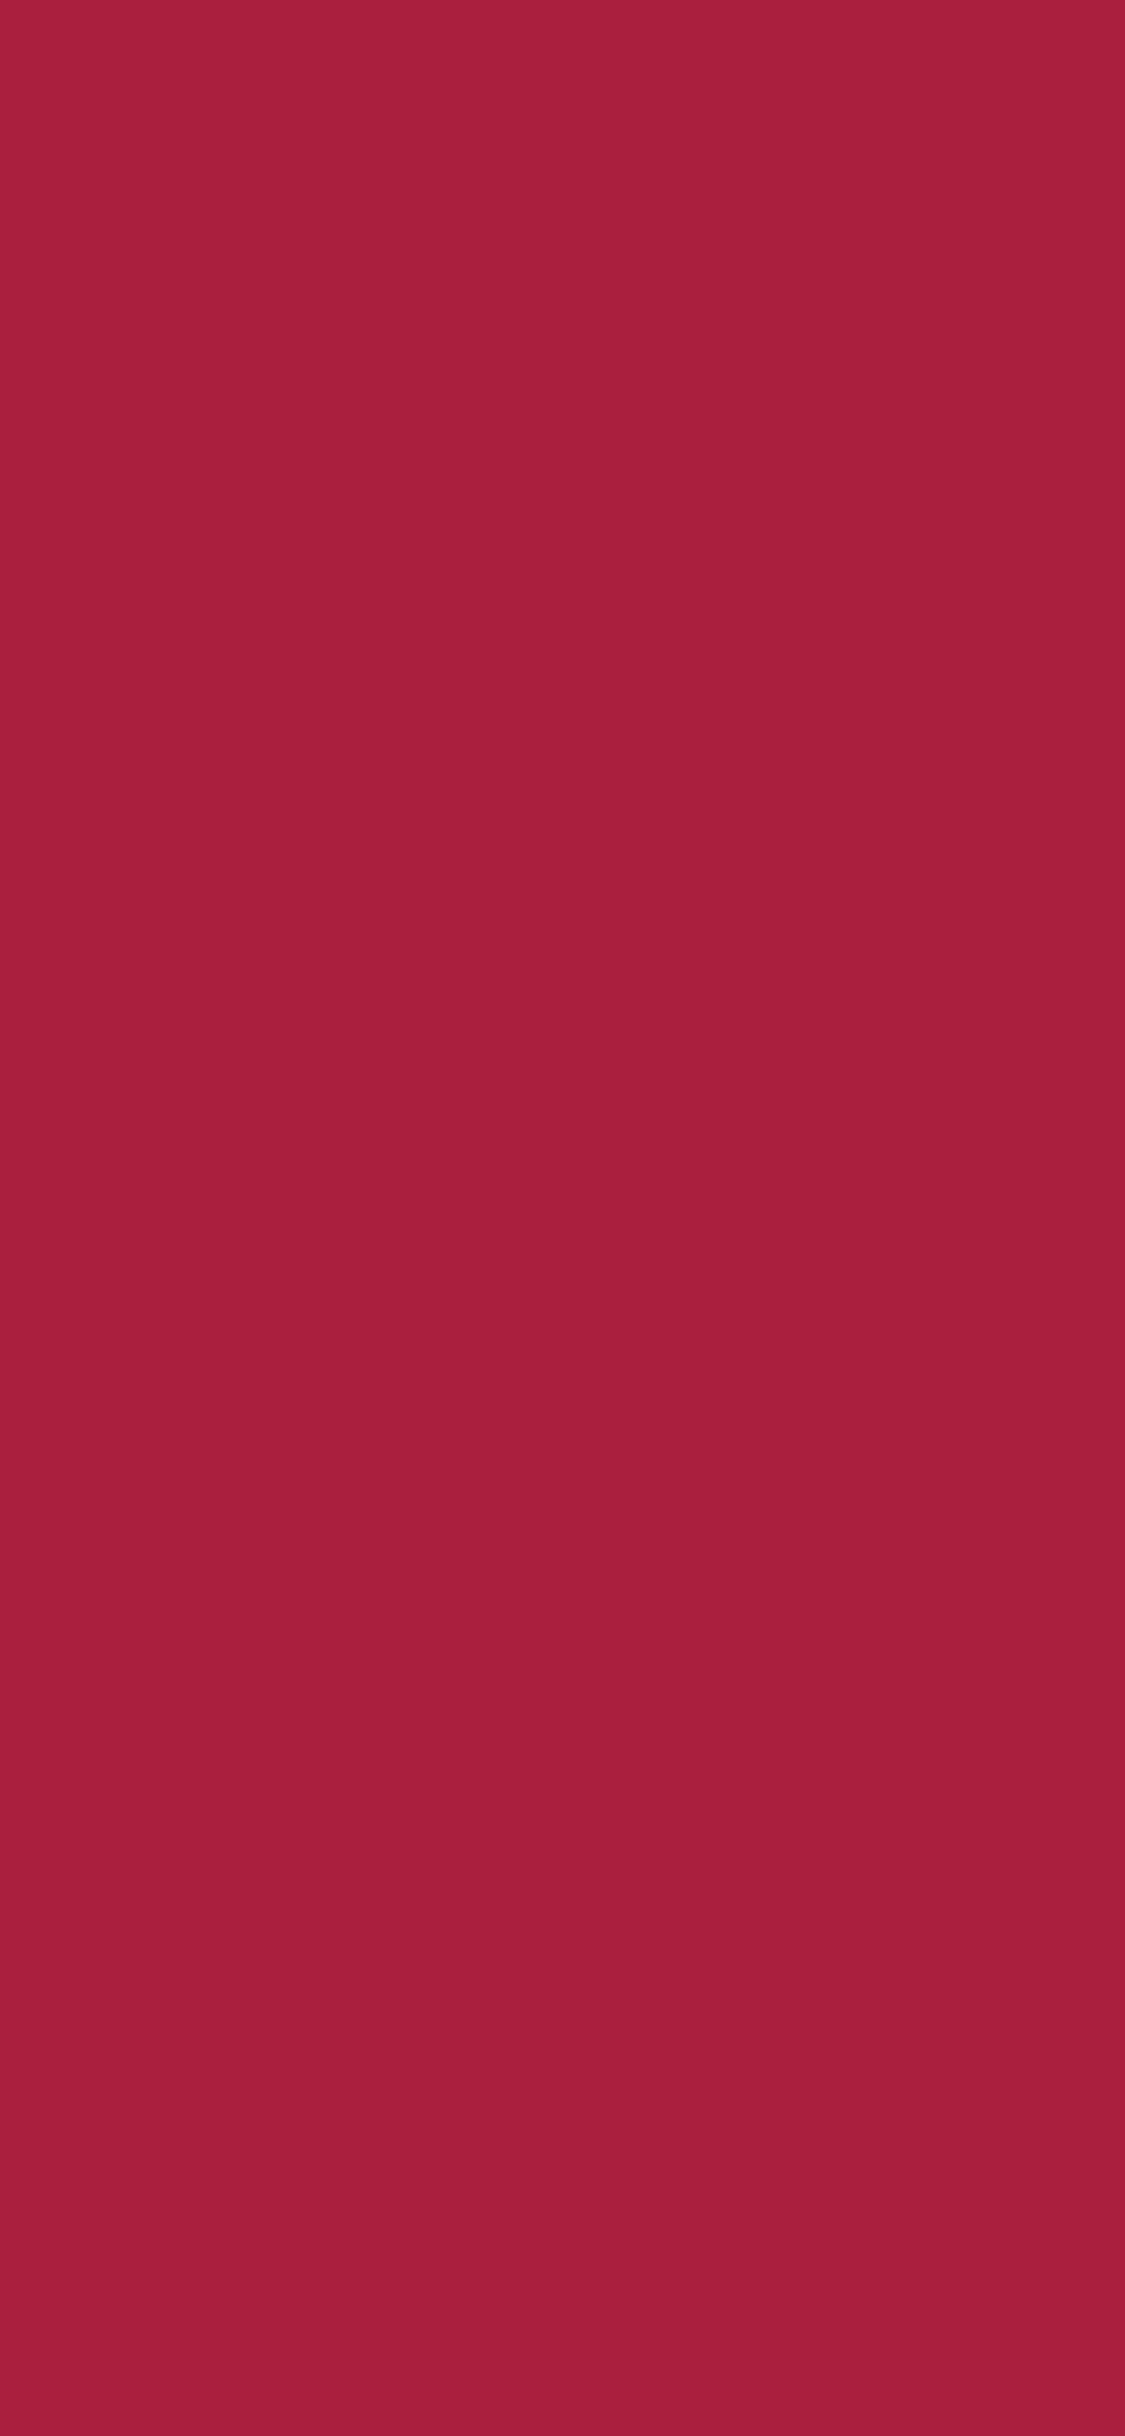 1125x2436 Deep Carmine Solid Color Background